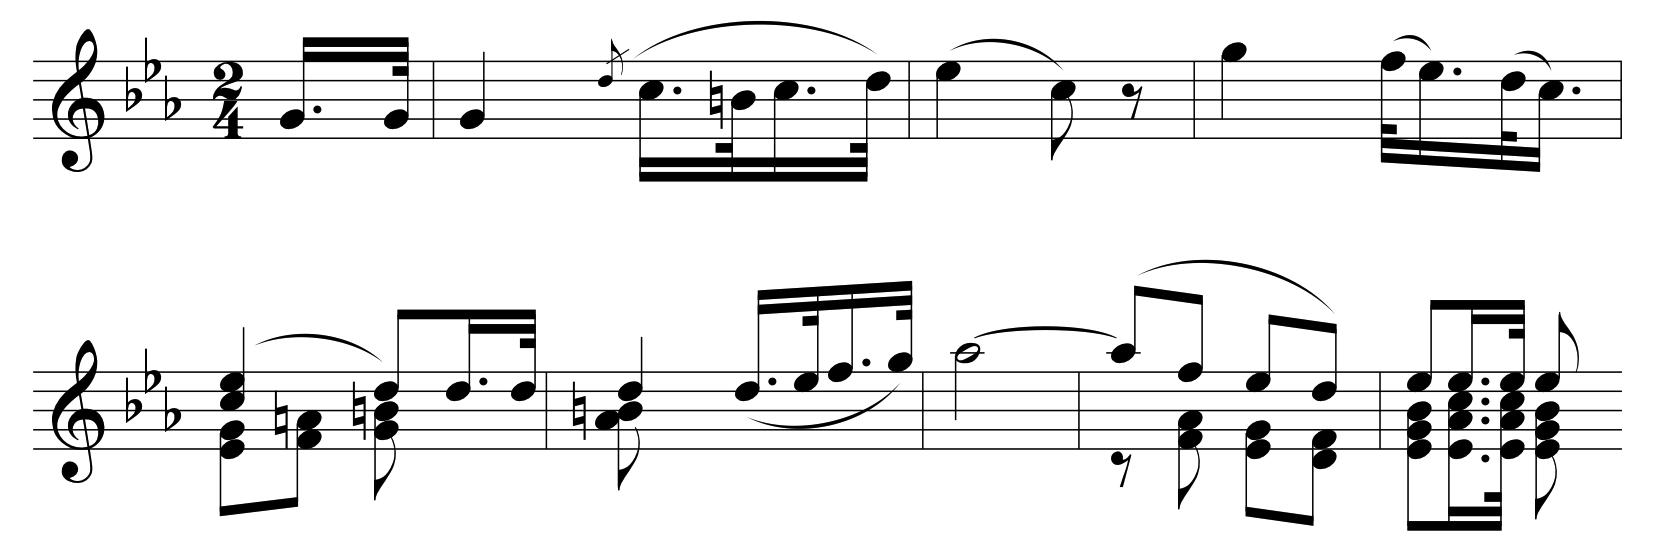 Music Crash Courses